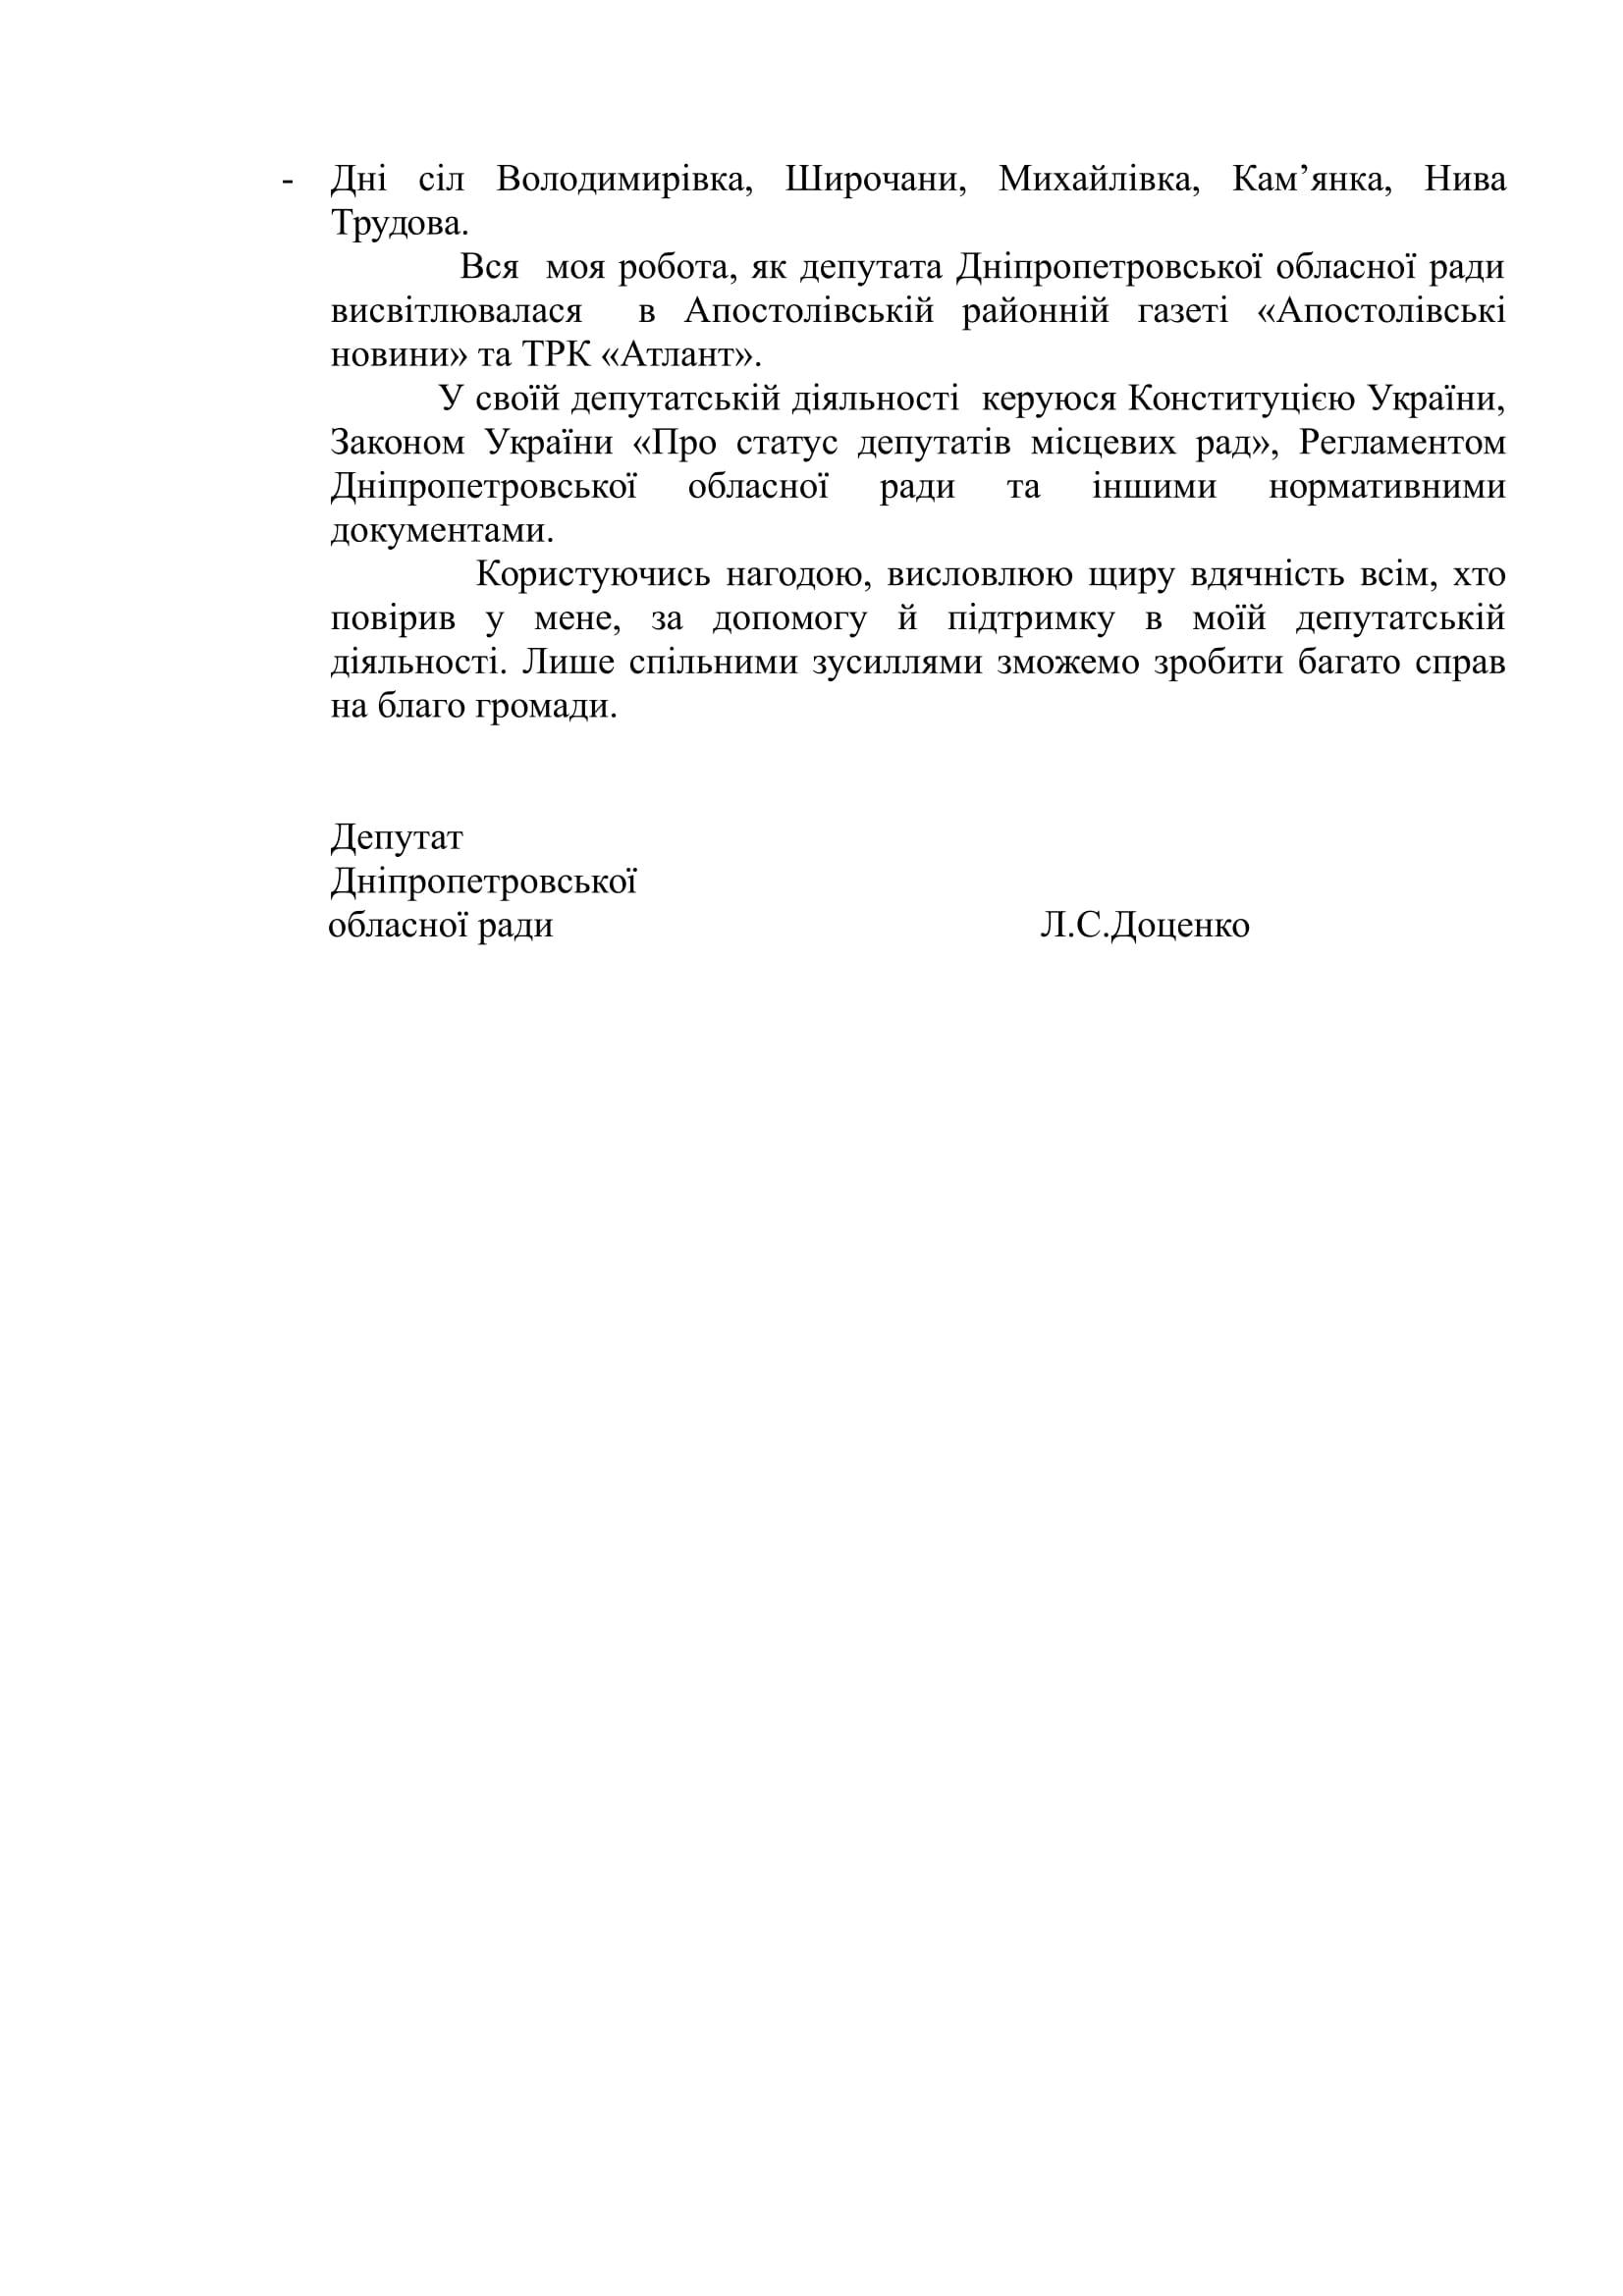 звіт 2 за 2017 рік Доценко Л.С.-4